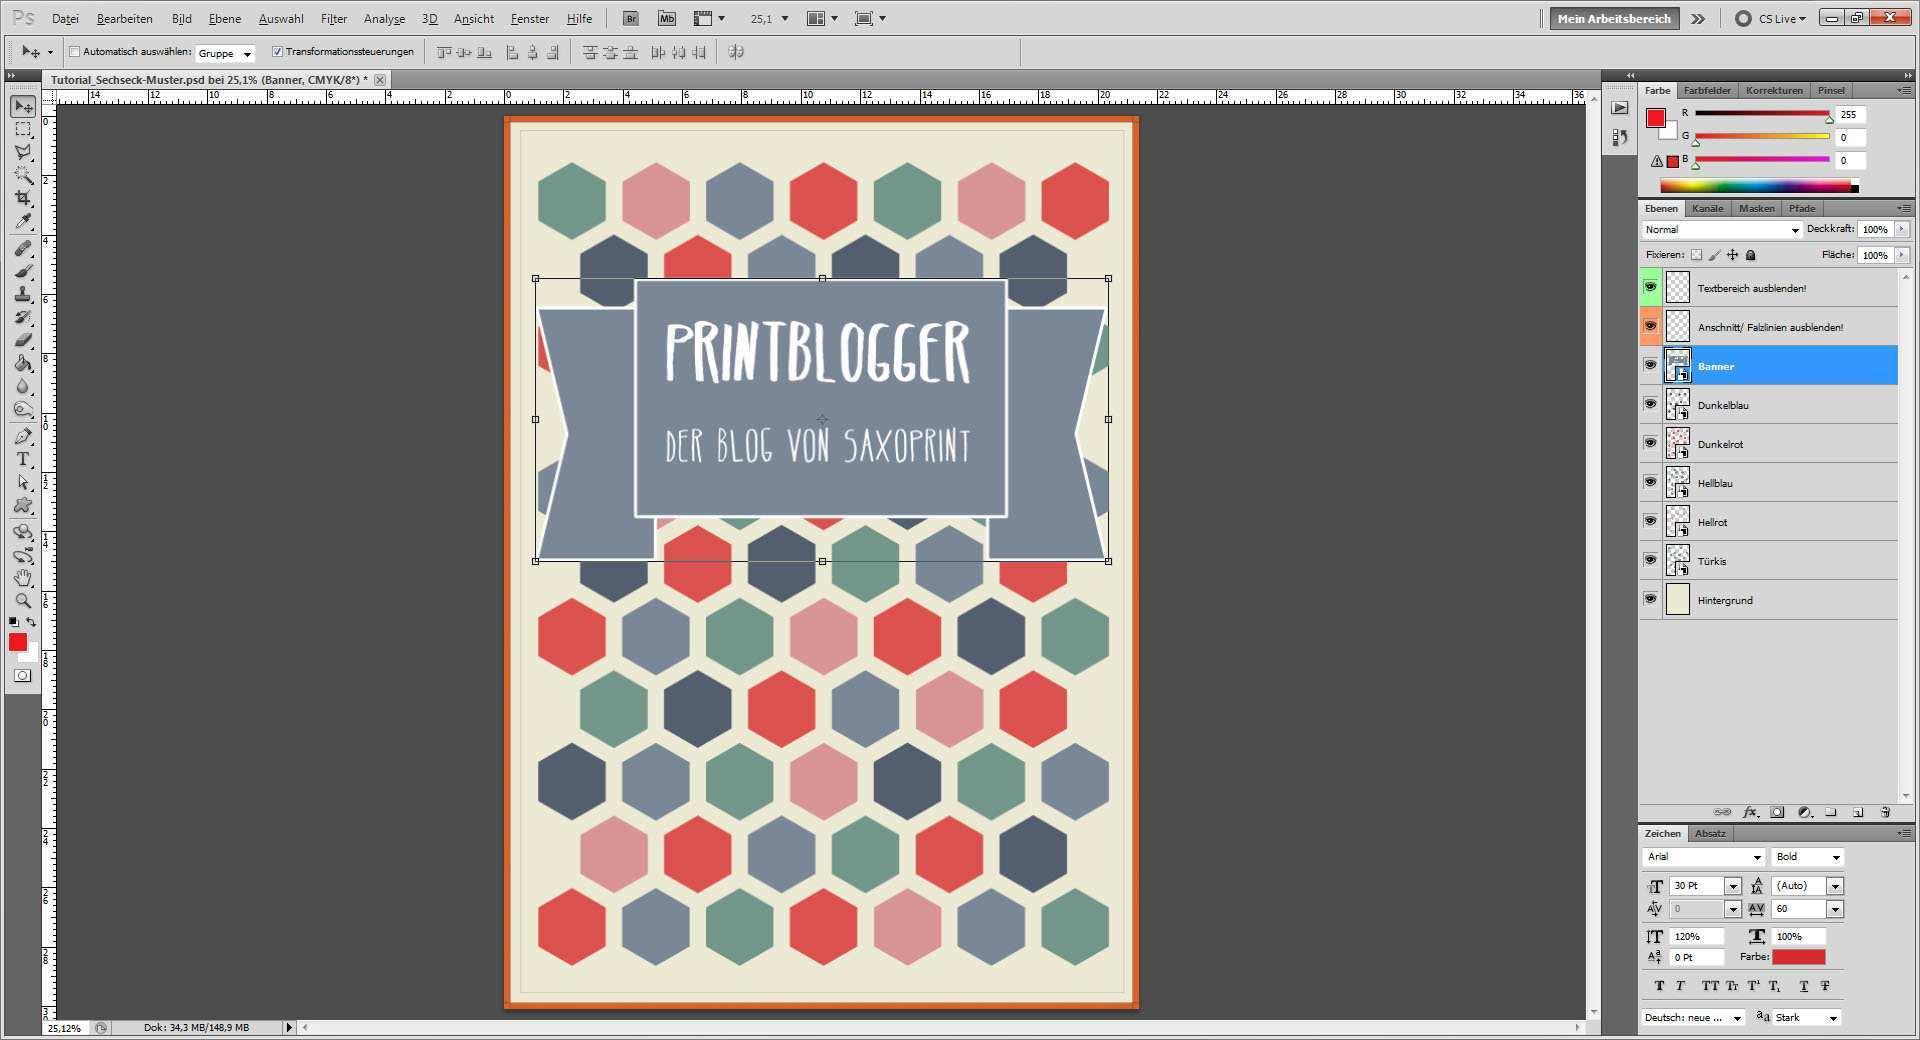 Tutorial Cover Mit Sechseck Muster Gestalten Saxoprint Blog